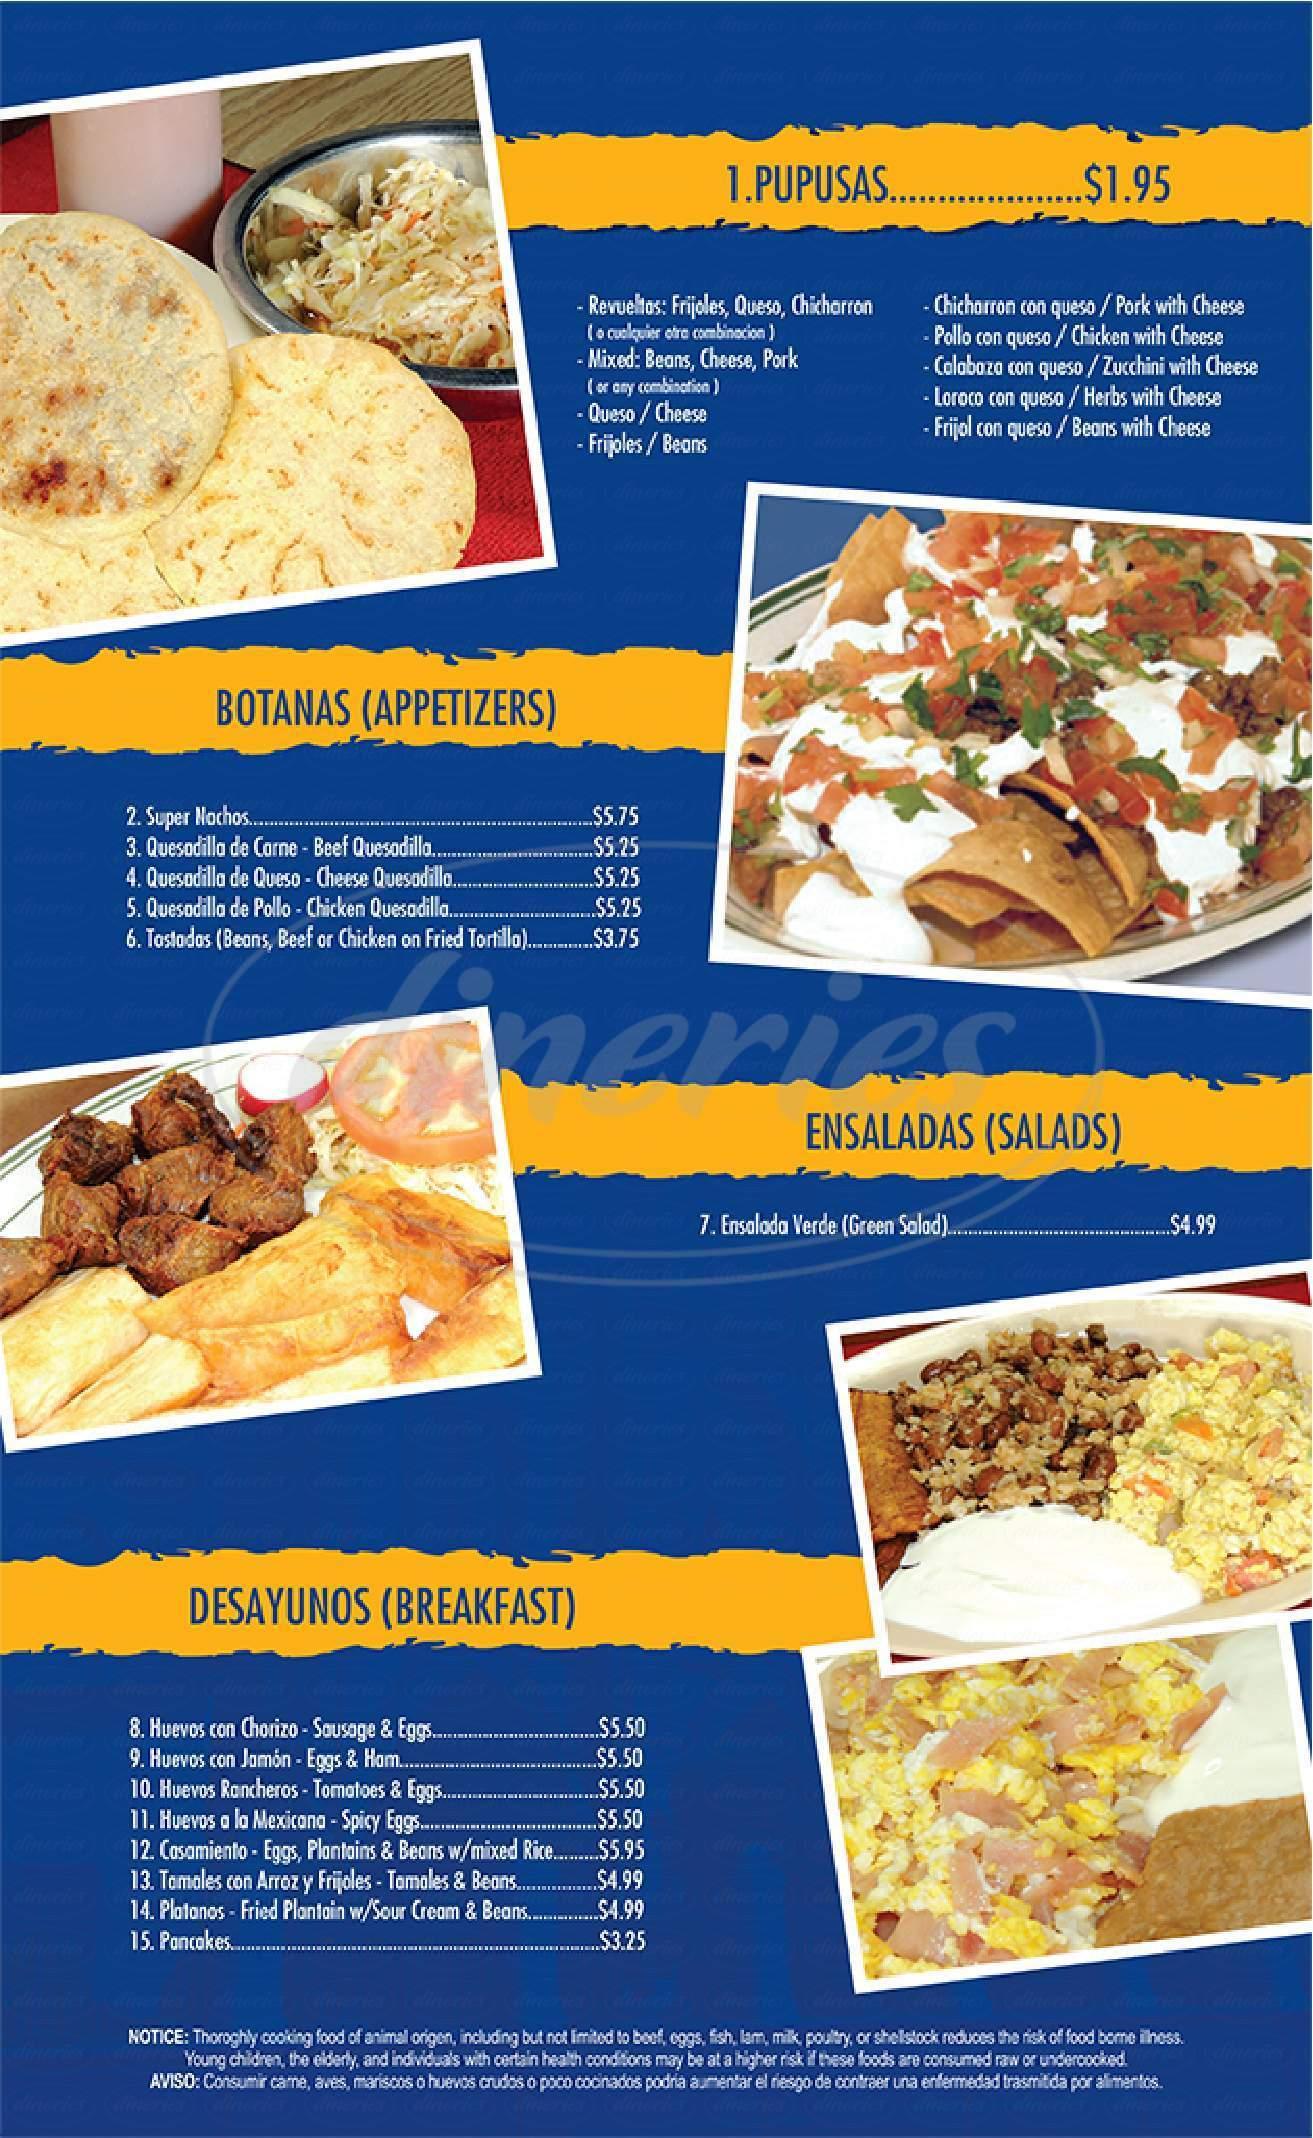 menu for Las Pupusas